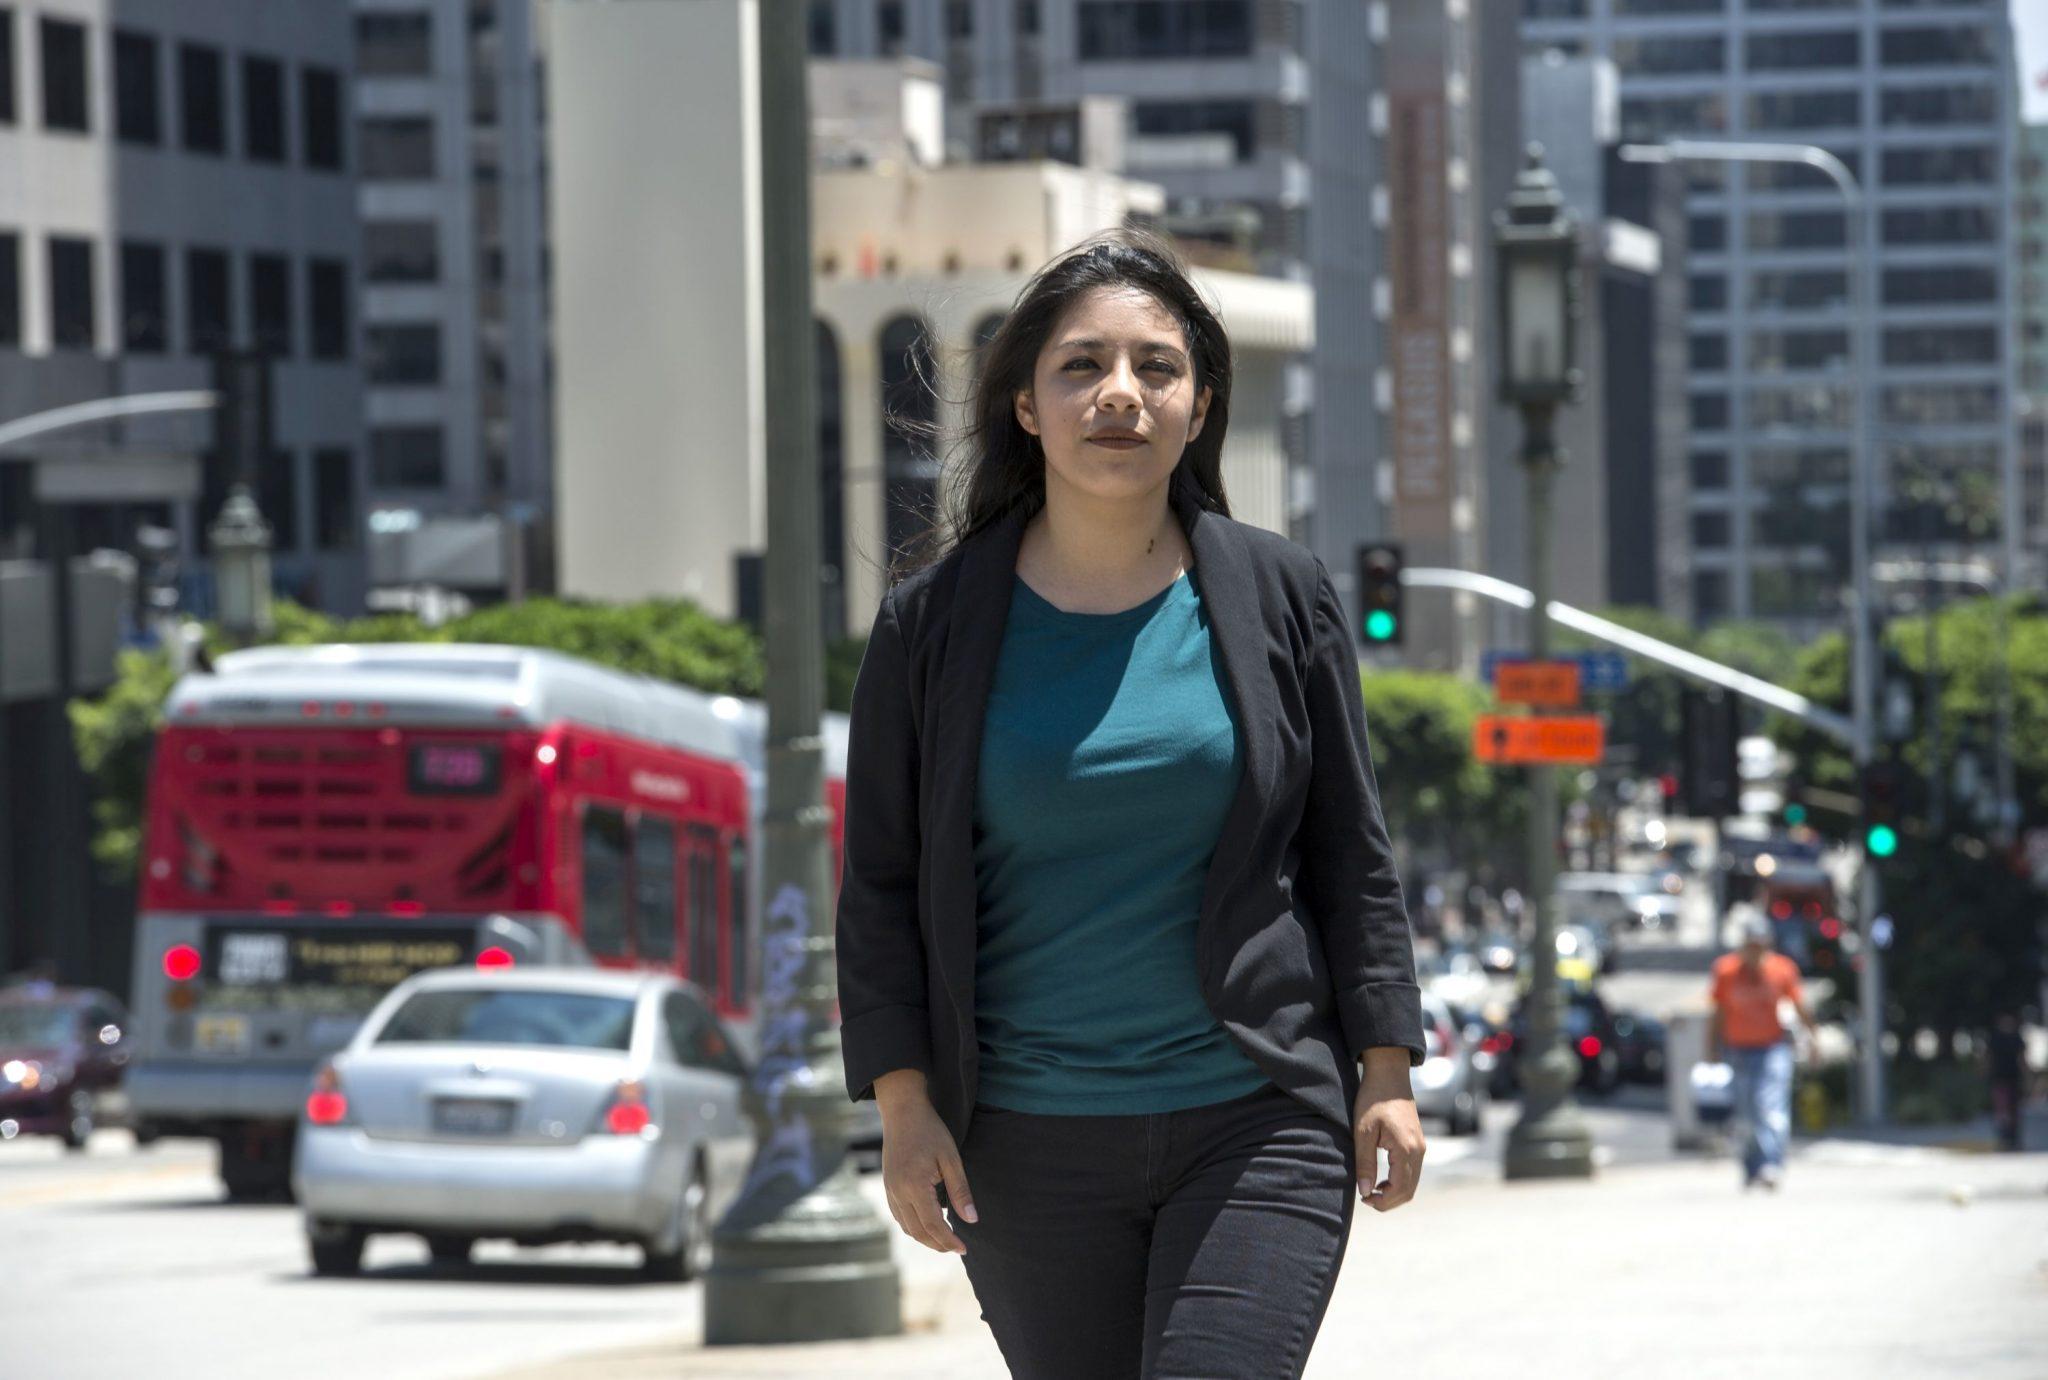 Undocumented Immigrants face uncertain future in USA